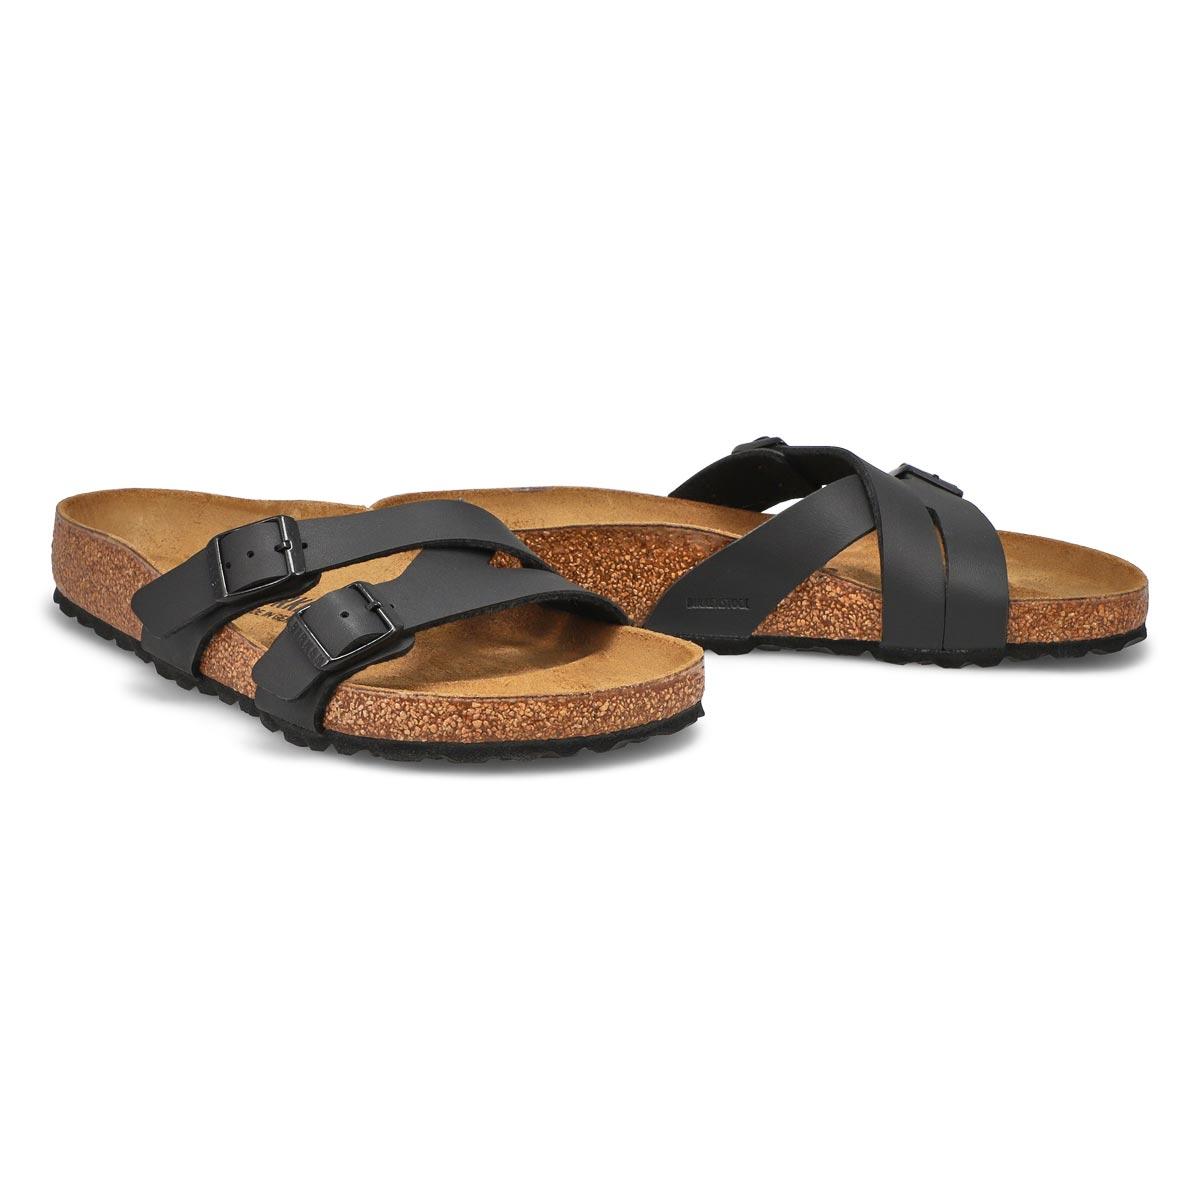 Lds Yao black 2 stap sandal